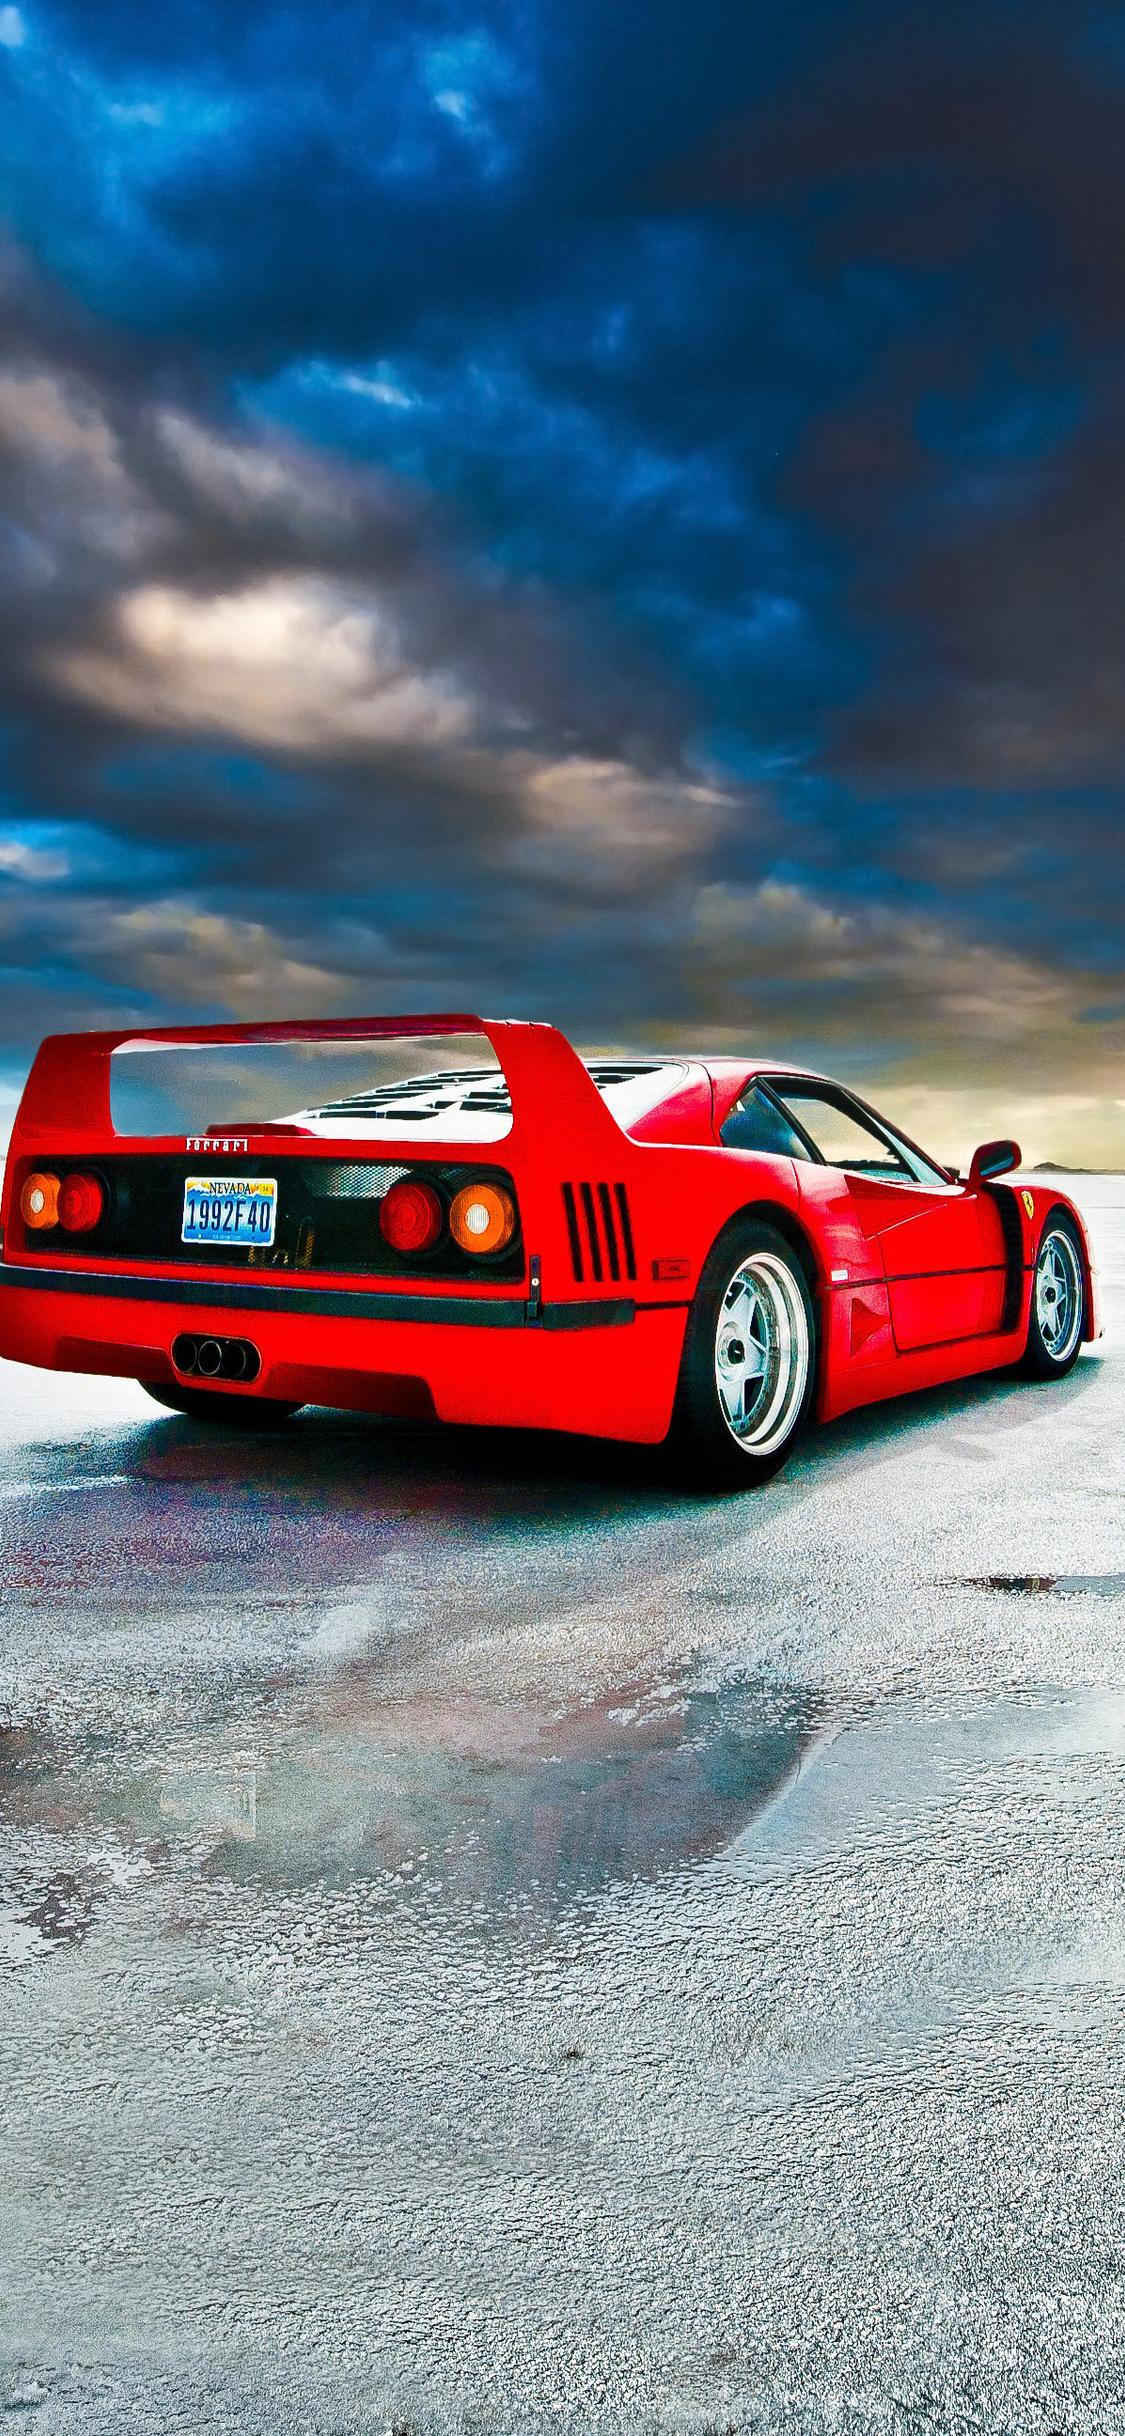 Ferrari F40 Iphone X Wallpaper Djiwallpaperco